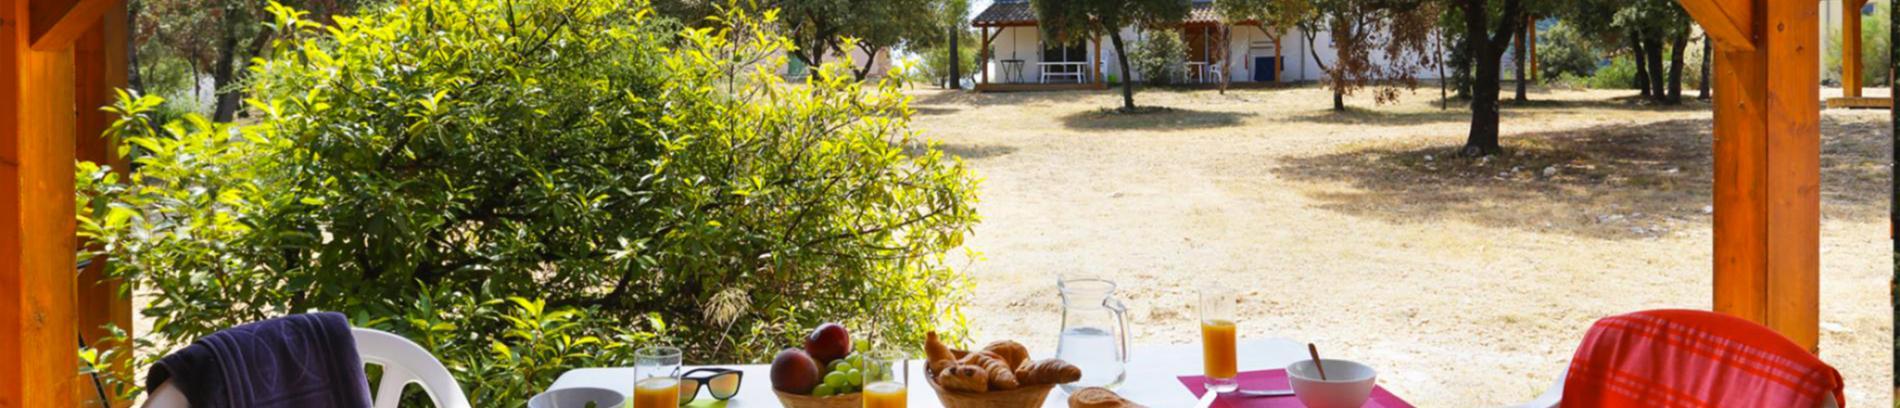 Slide déjeuner en terrasse